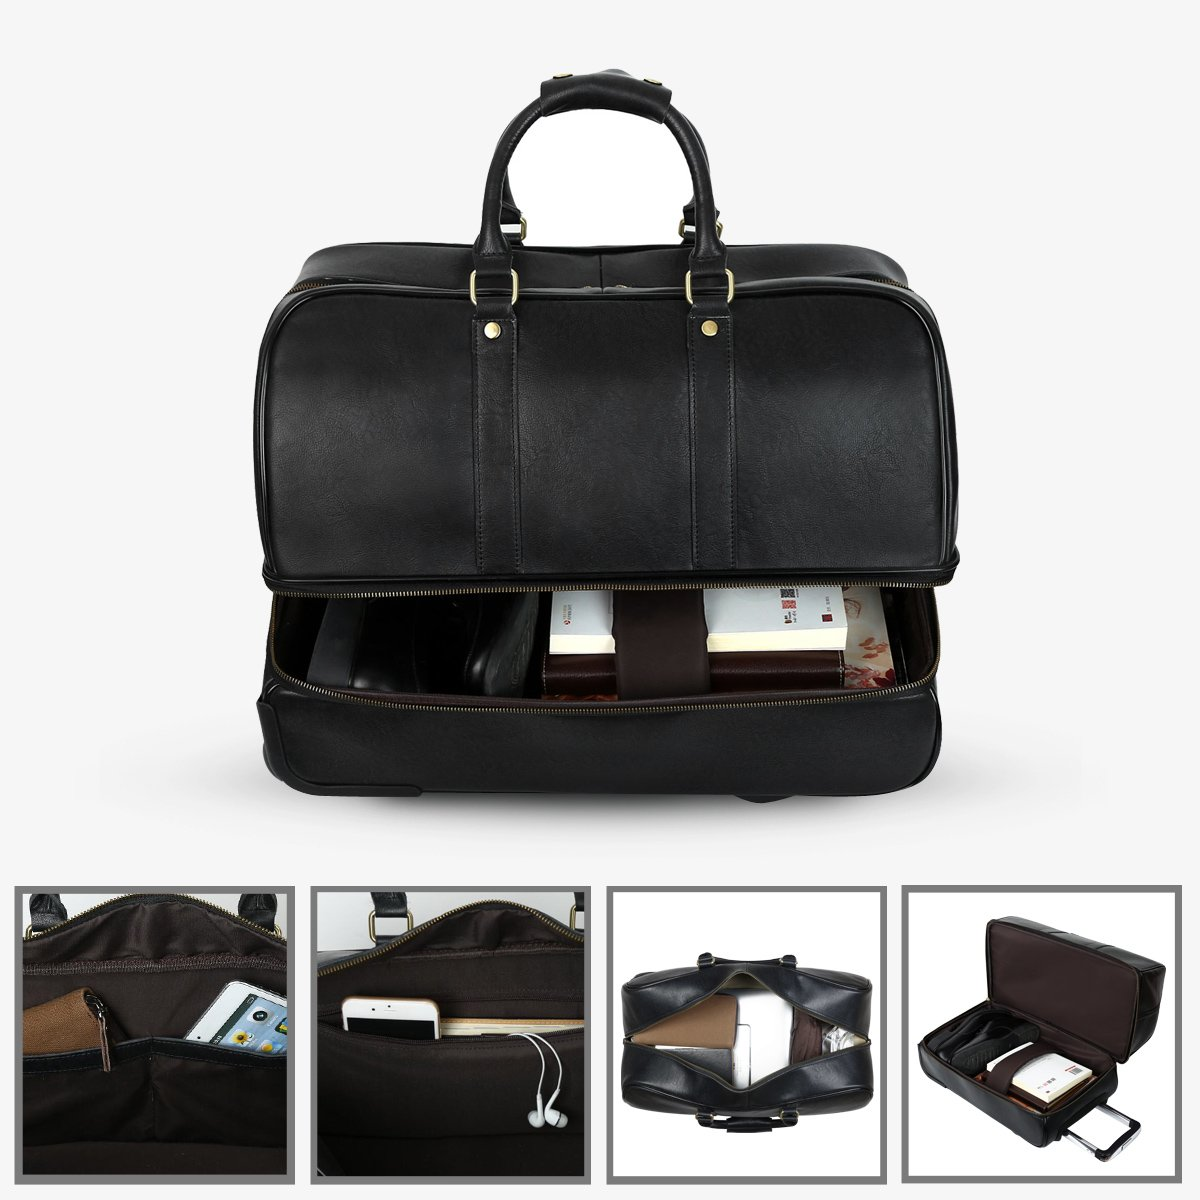 Leathario Men's Leather Luggage Wheeled Duffle, Leather Travel Bag (Black) by Leathario (Image #5)